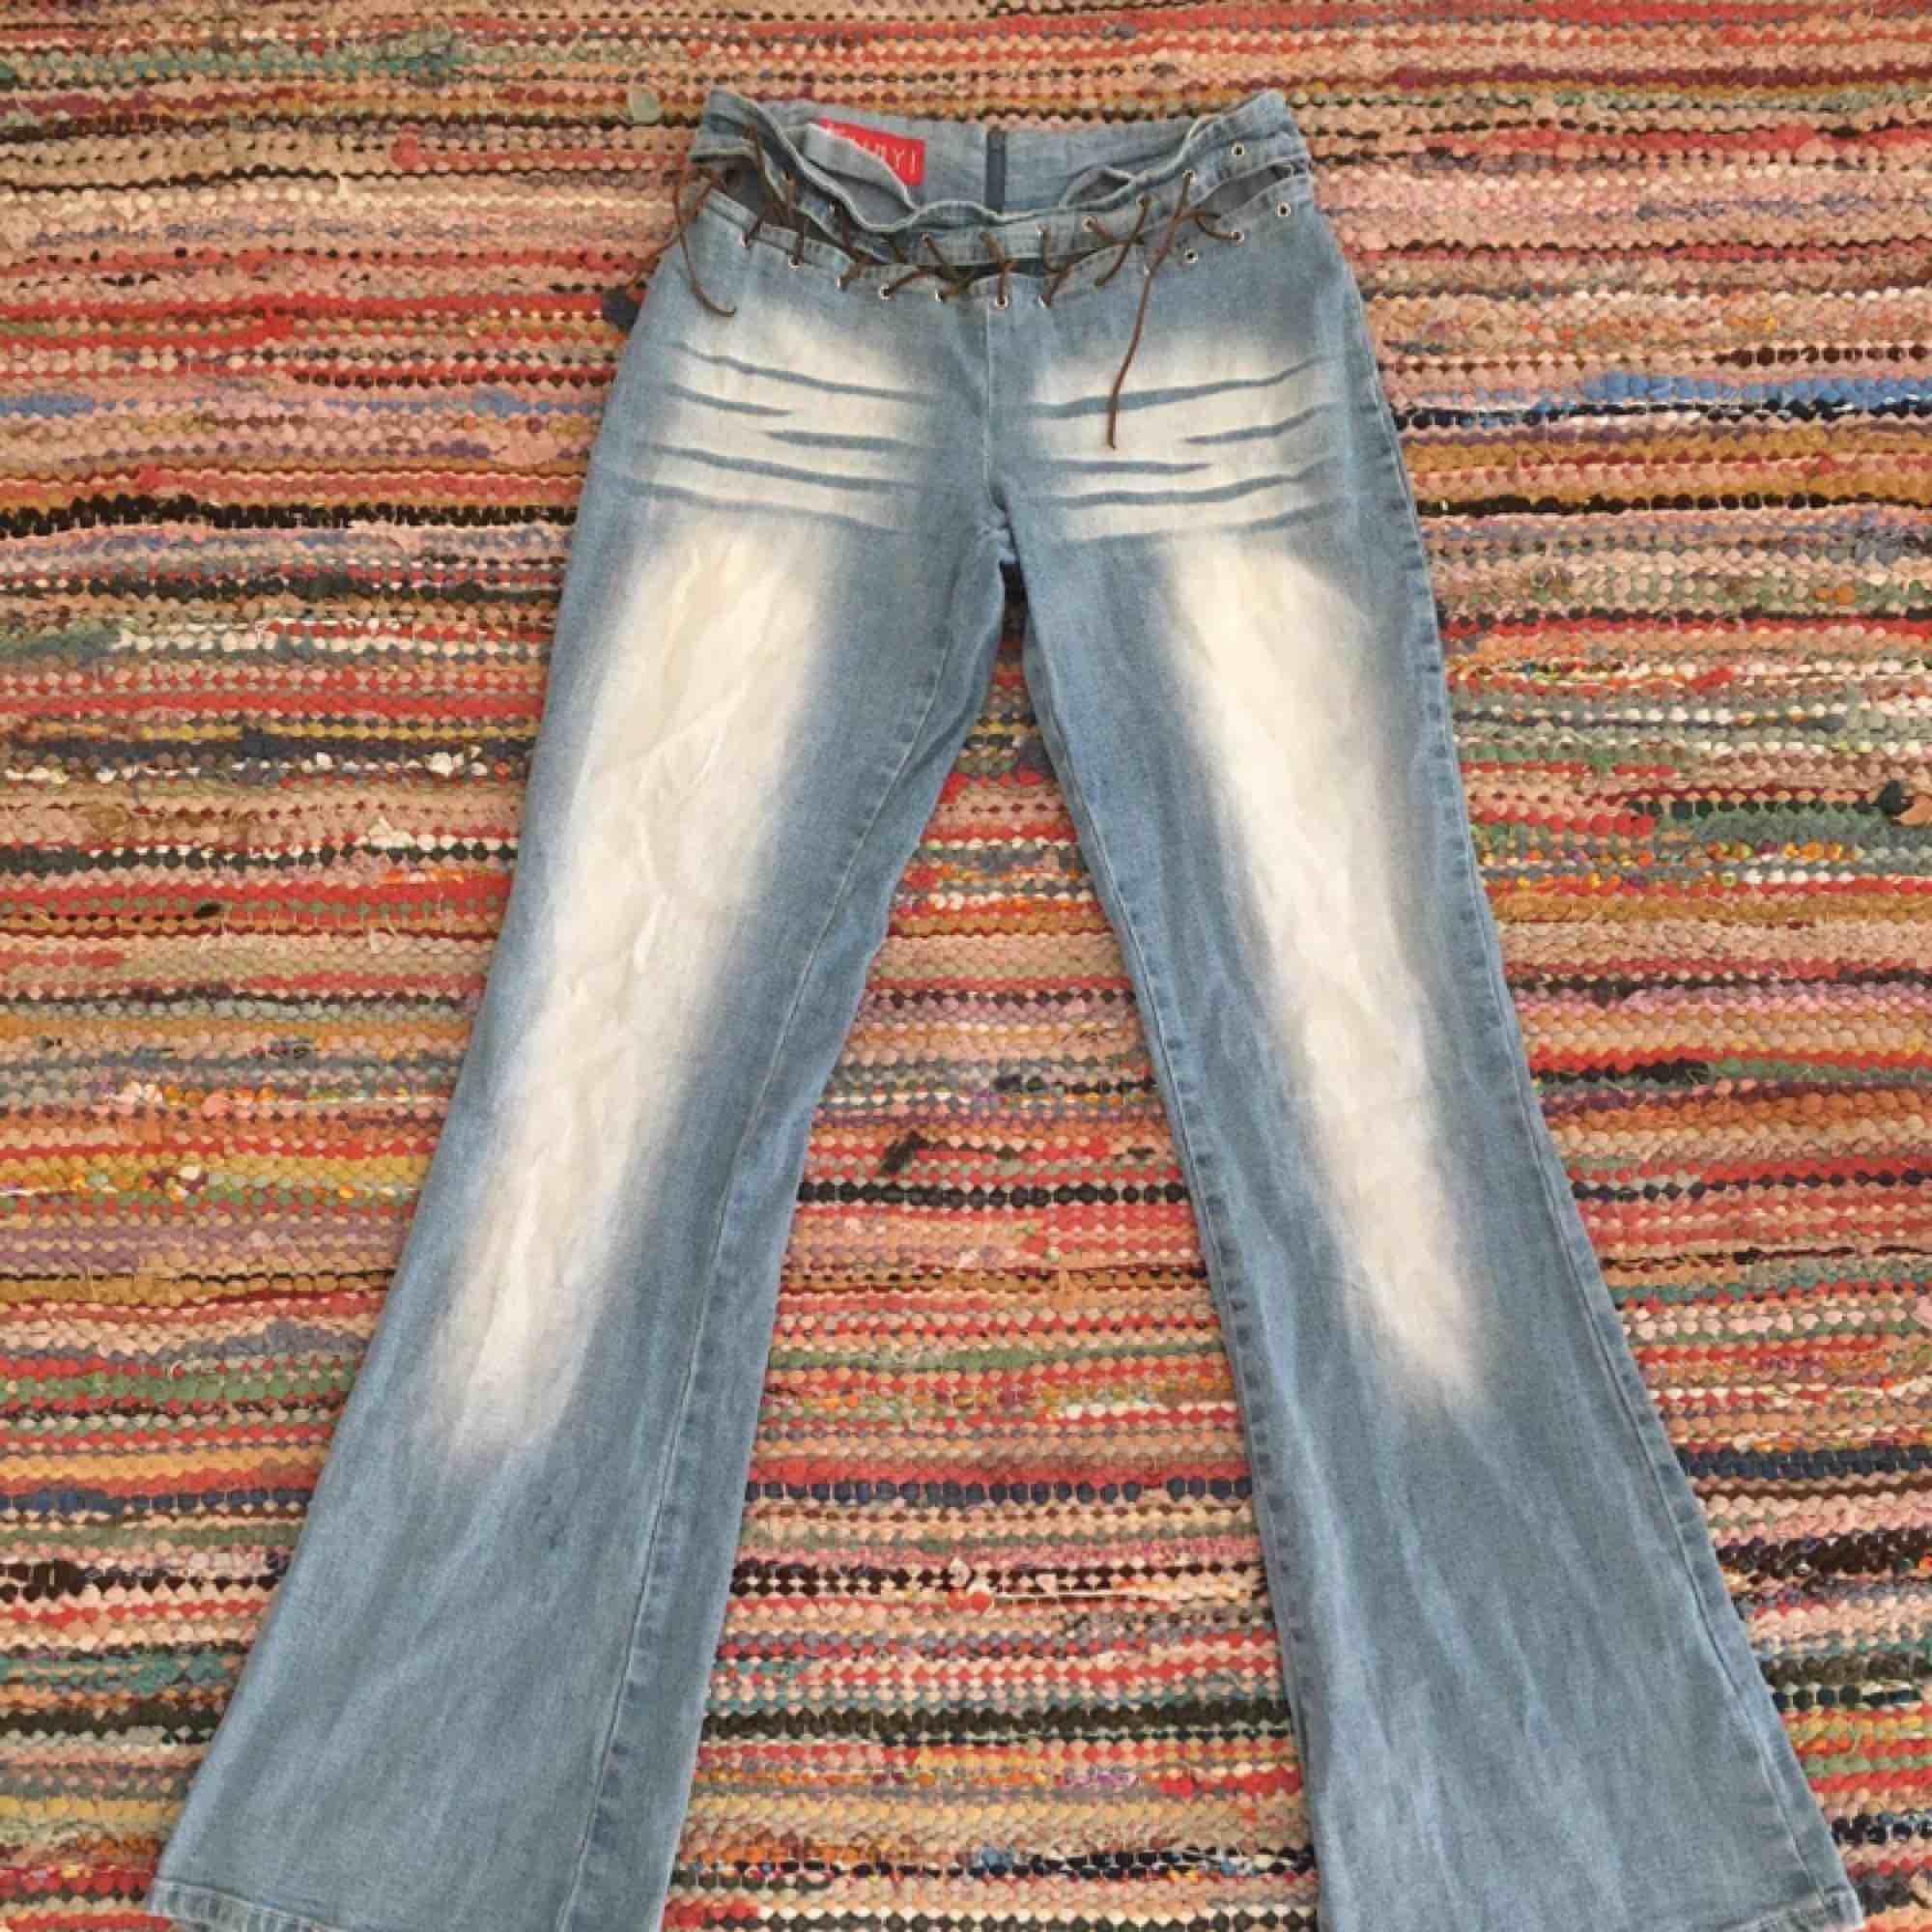 Bootcut jeans med dragkedja bak o läderband fram! Köparen betalar frakt! a9fd6a25b1130